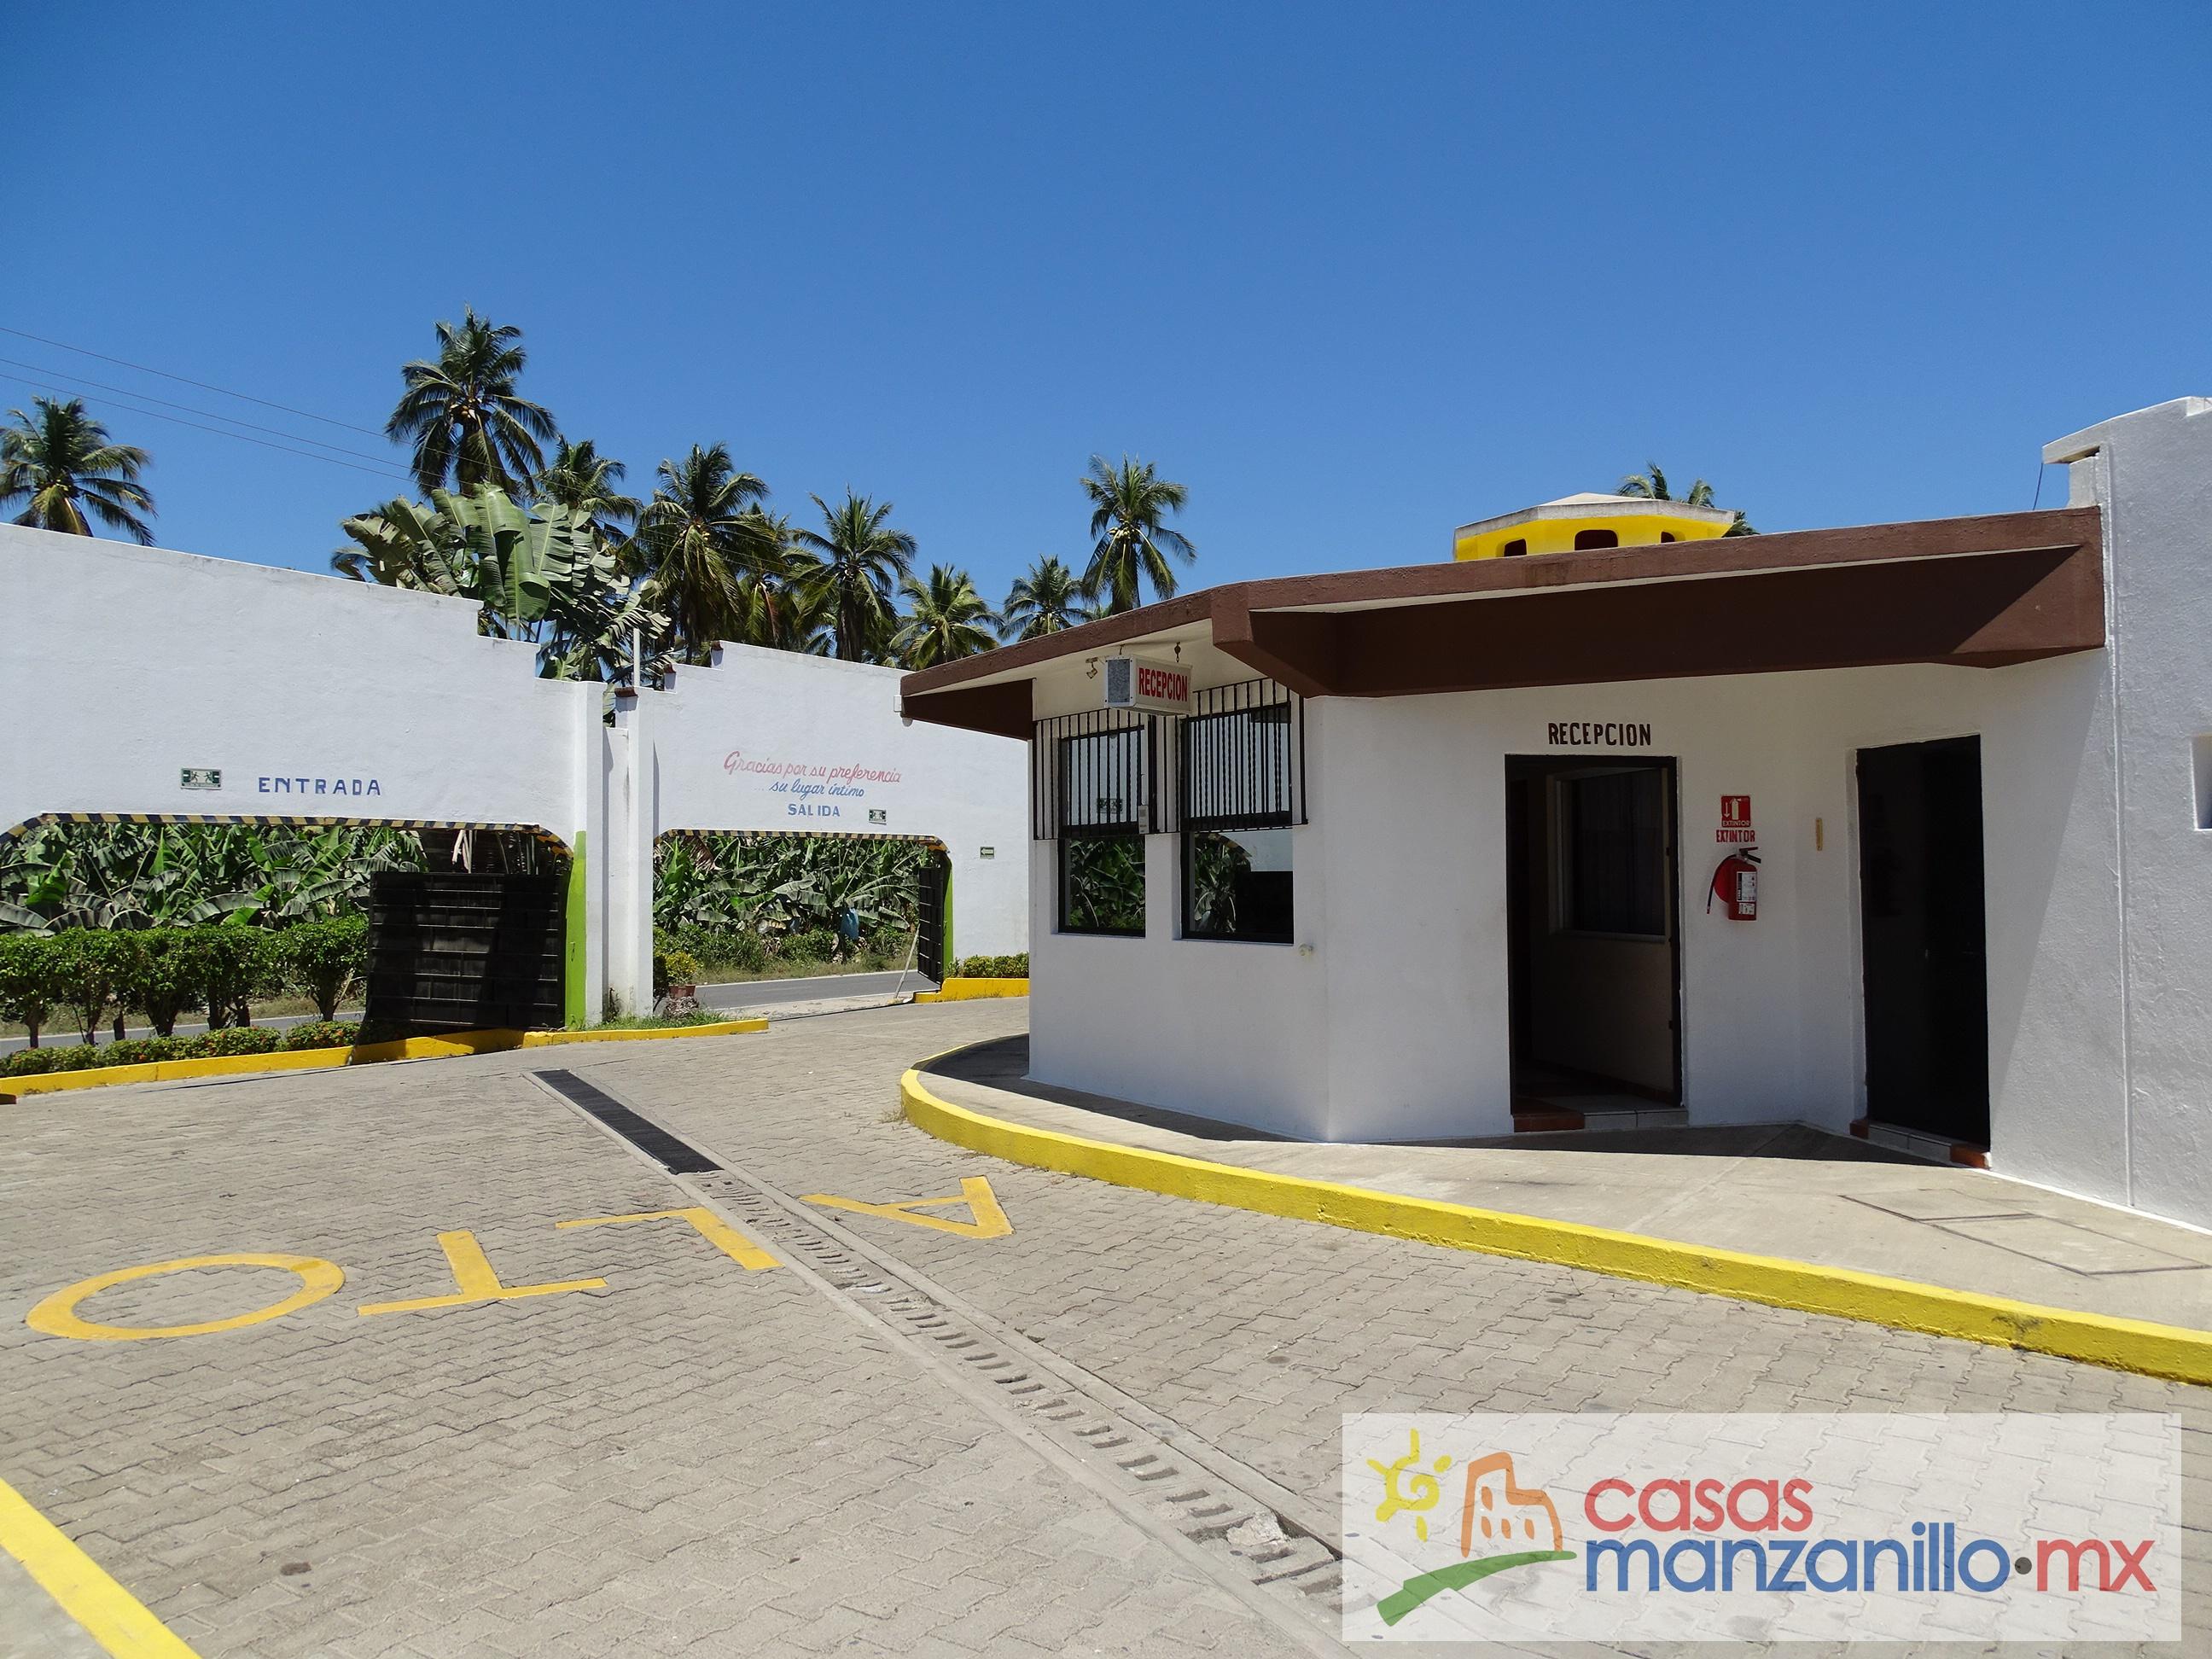 Motel VENTA Manzanillo - Dunas (7)